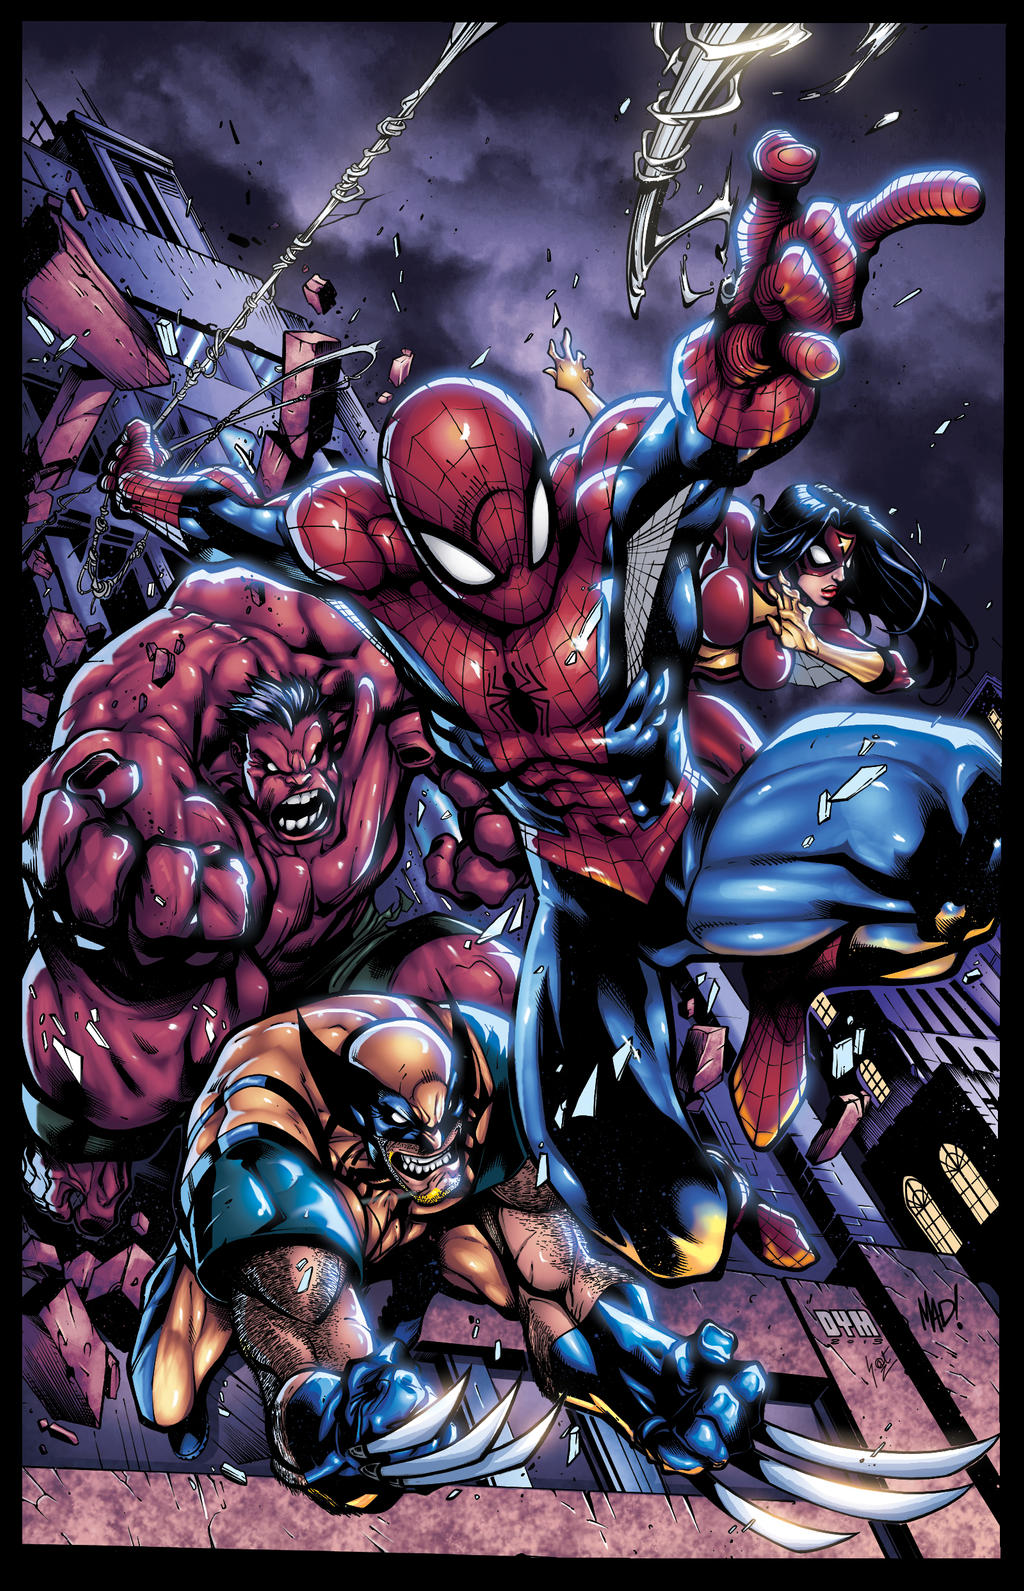 Avenging Spiderman Promo By Mad XGX V2 by knytcrawlr